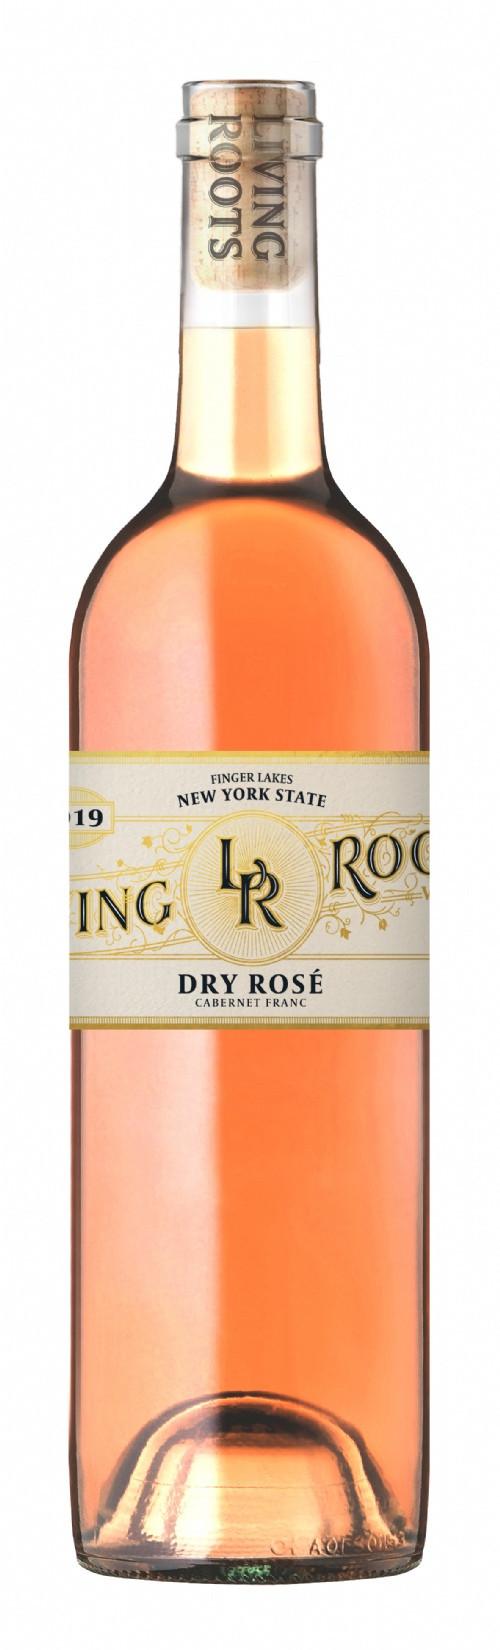 2020 Living Roots Dry Rose Cabernet Franc 750ml